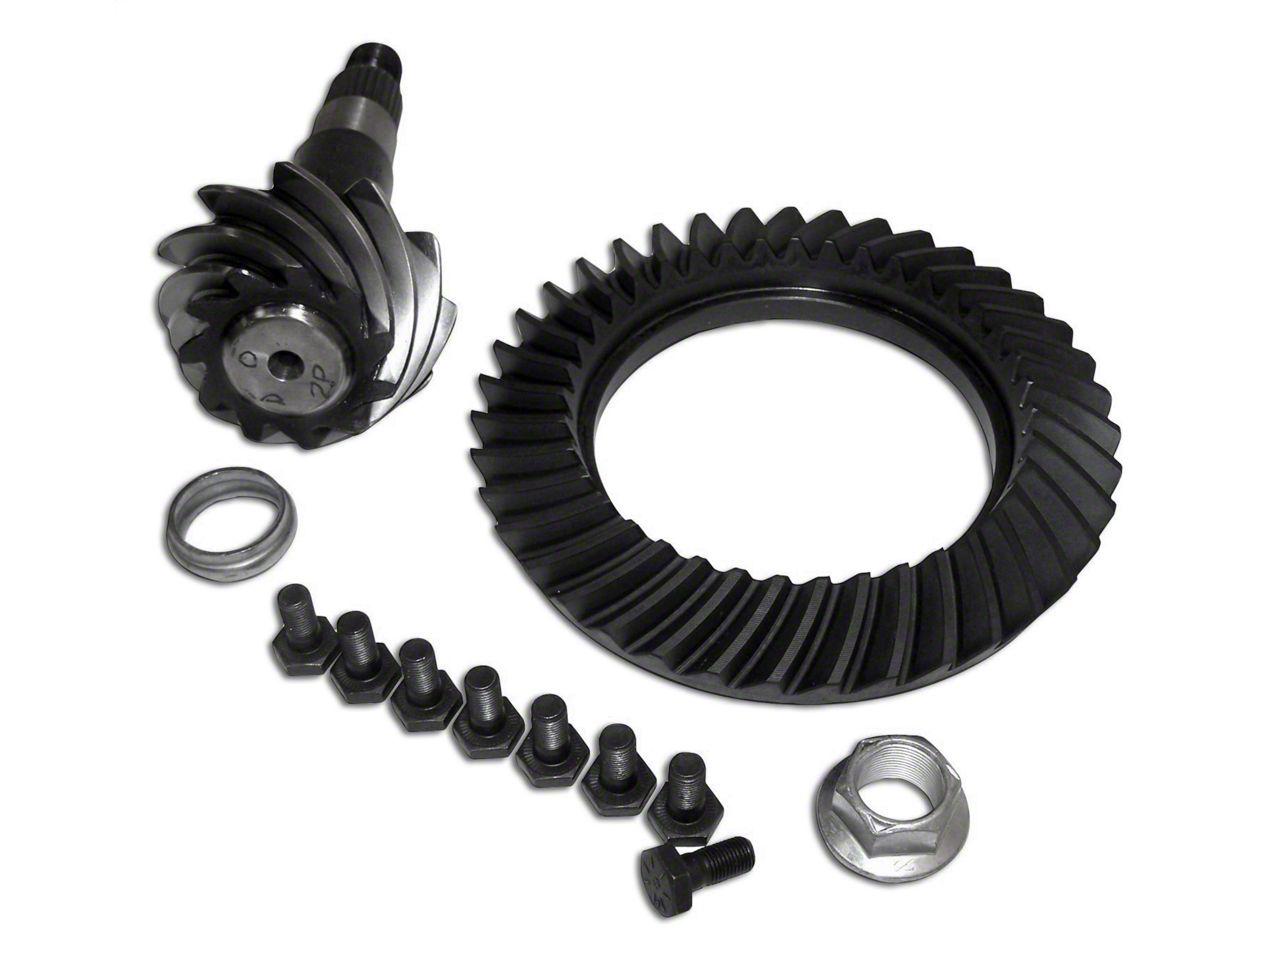 Omix-ADA Dana 35 Rear Ring Gear and Pinion Kit - 3.55 Gears (87-93 Jeep Wrangler YJ)